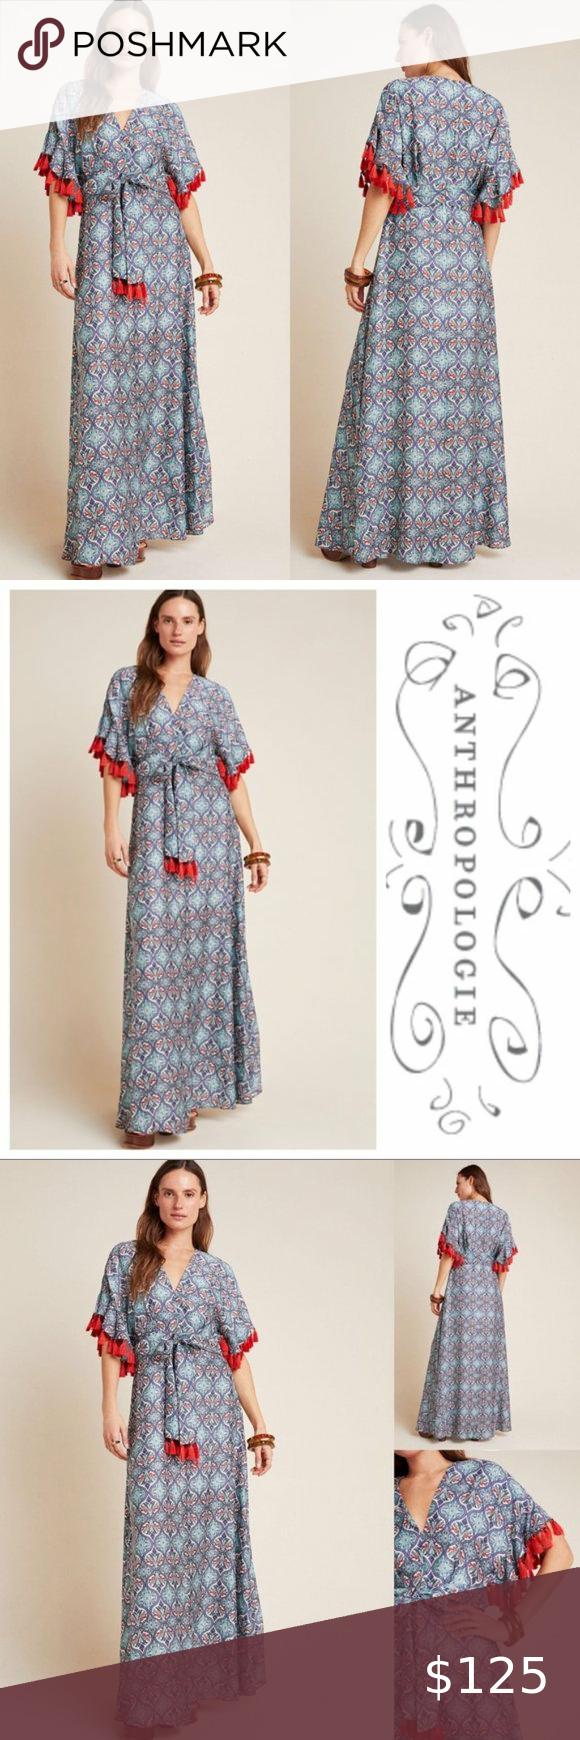 30+ Anthropologie tasseled maxi dress ideas